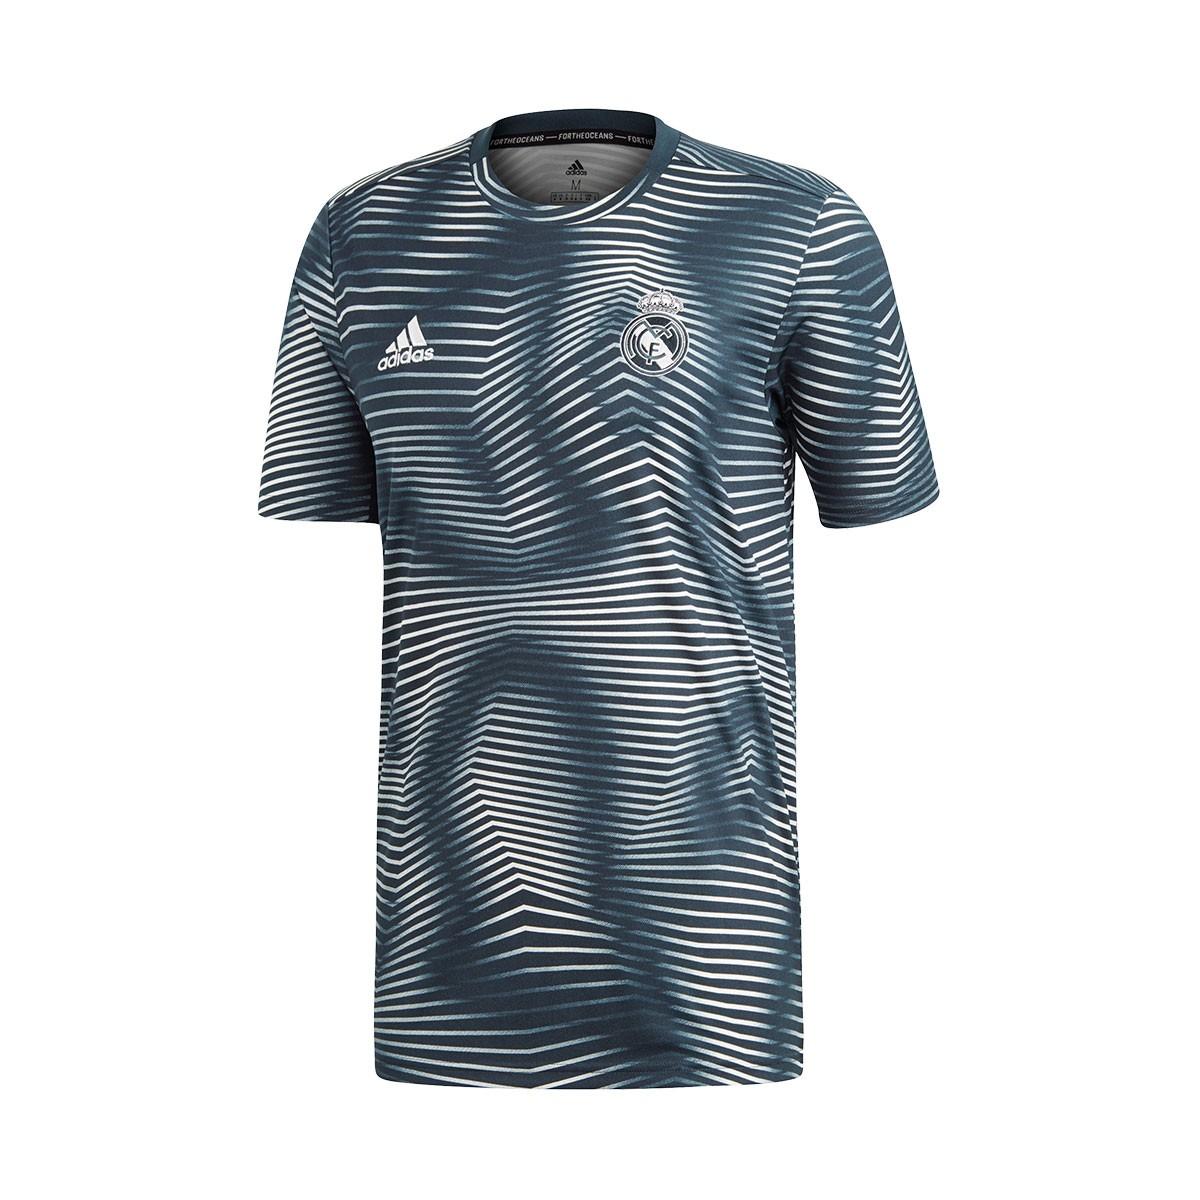 78c2e1f36d24e Camiseta adidas Real Madrid PrematchI 2018-2019 Tech onix-Core white -  Tienda de fútbol Fútbol Emotion